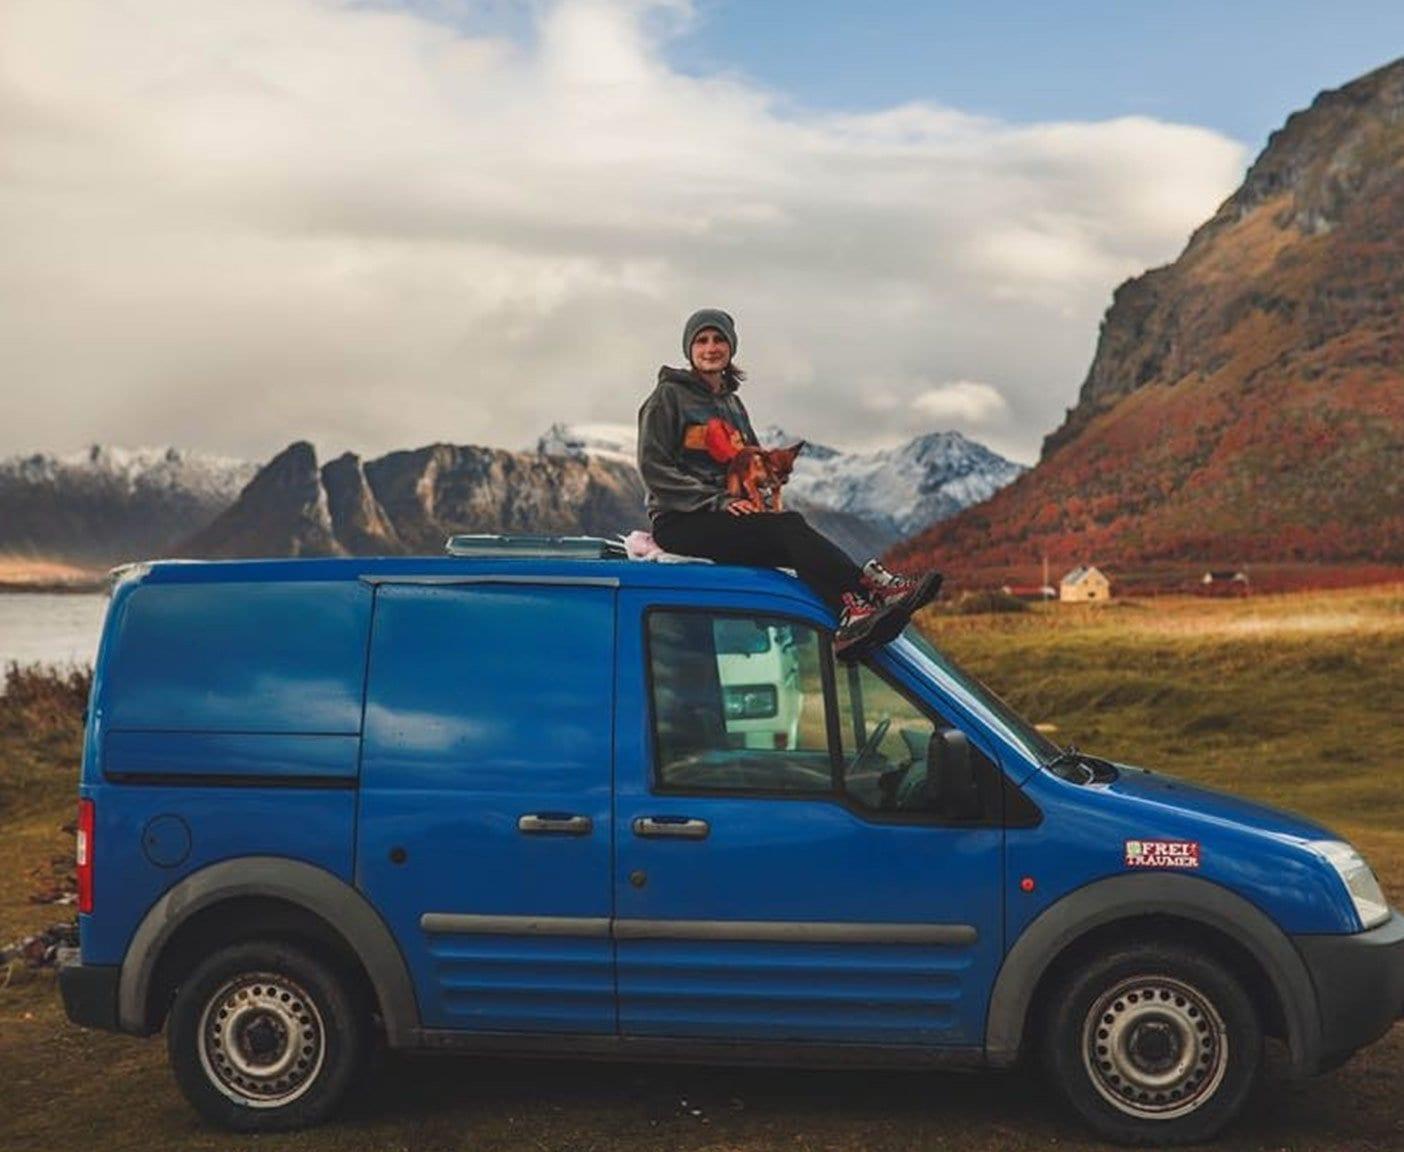 Ford-transit-connect-ladeflÑche-camper-l2-norwegen-frau-alleine-mikro-camper